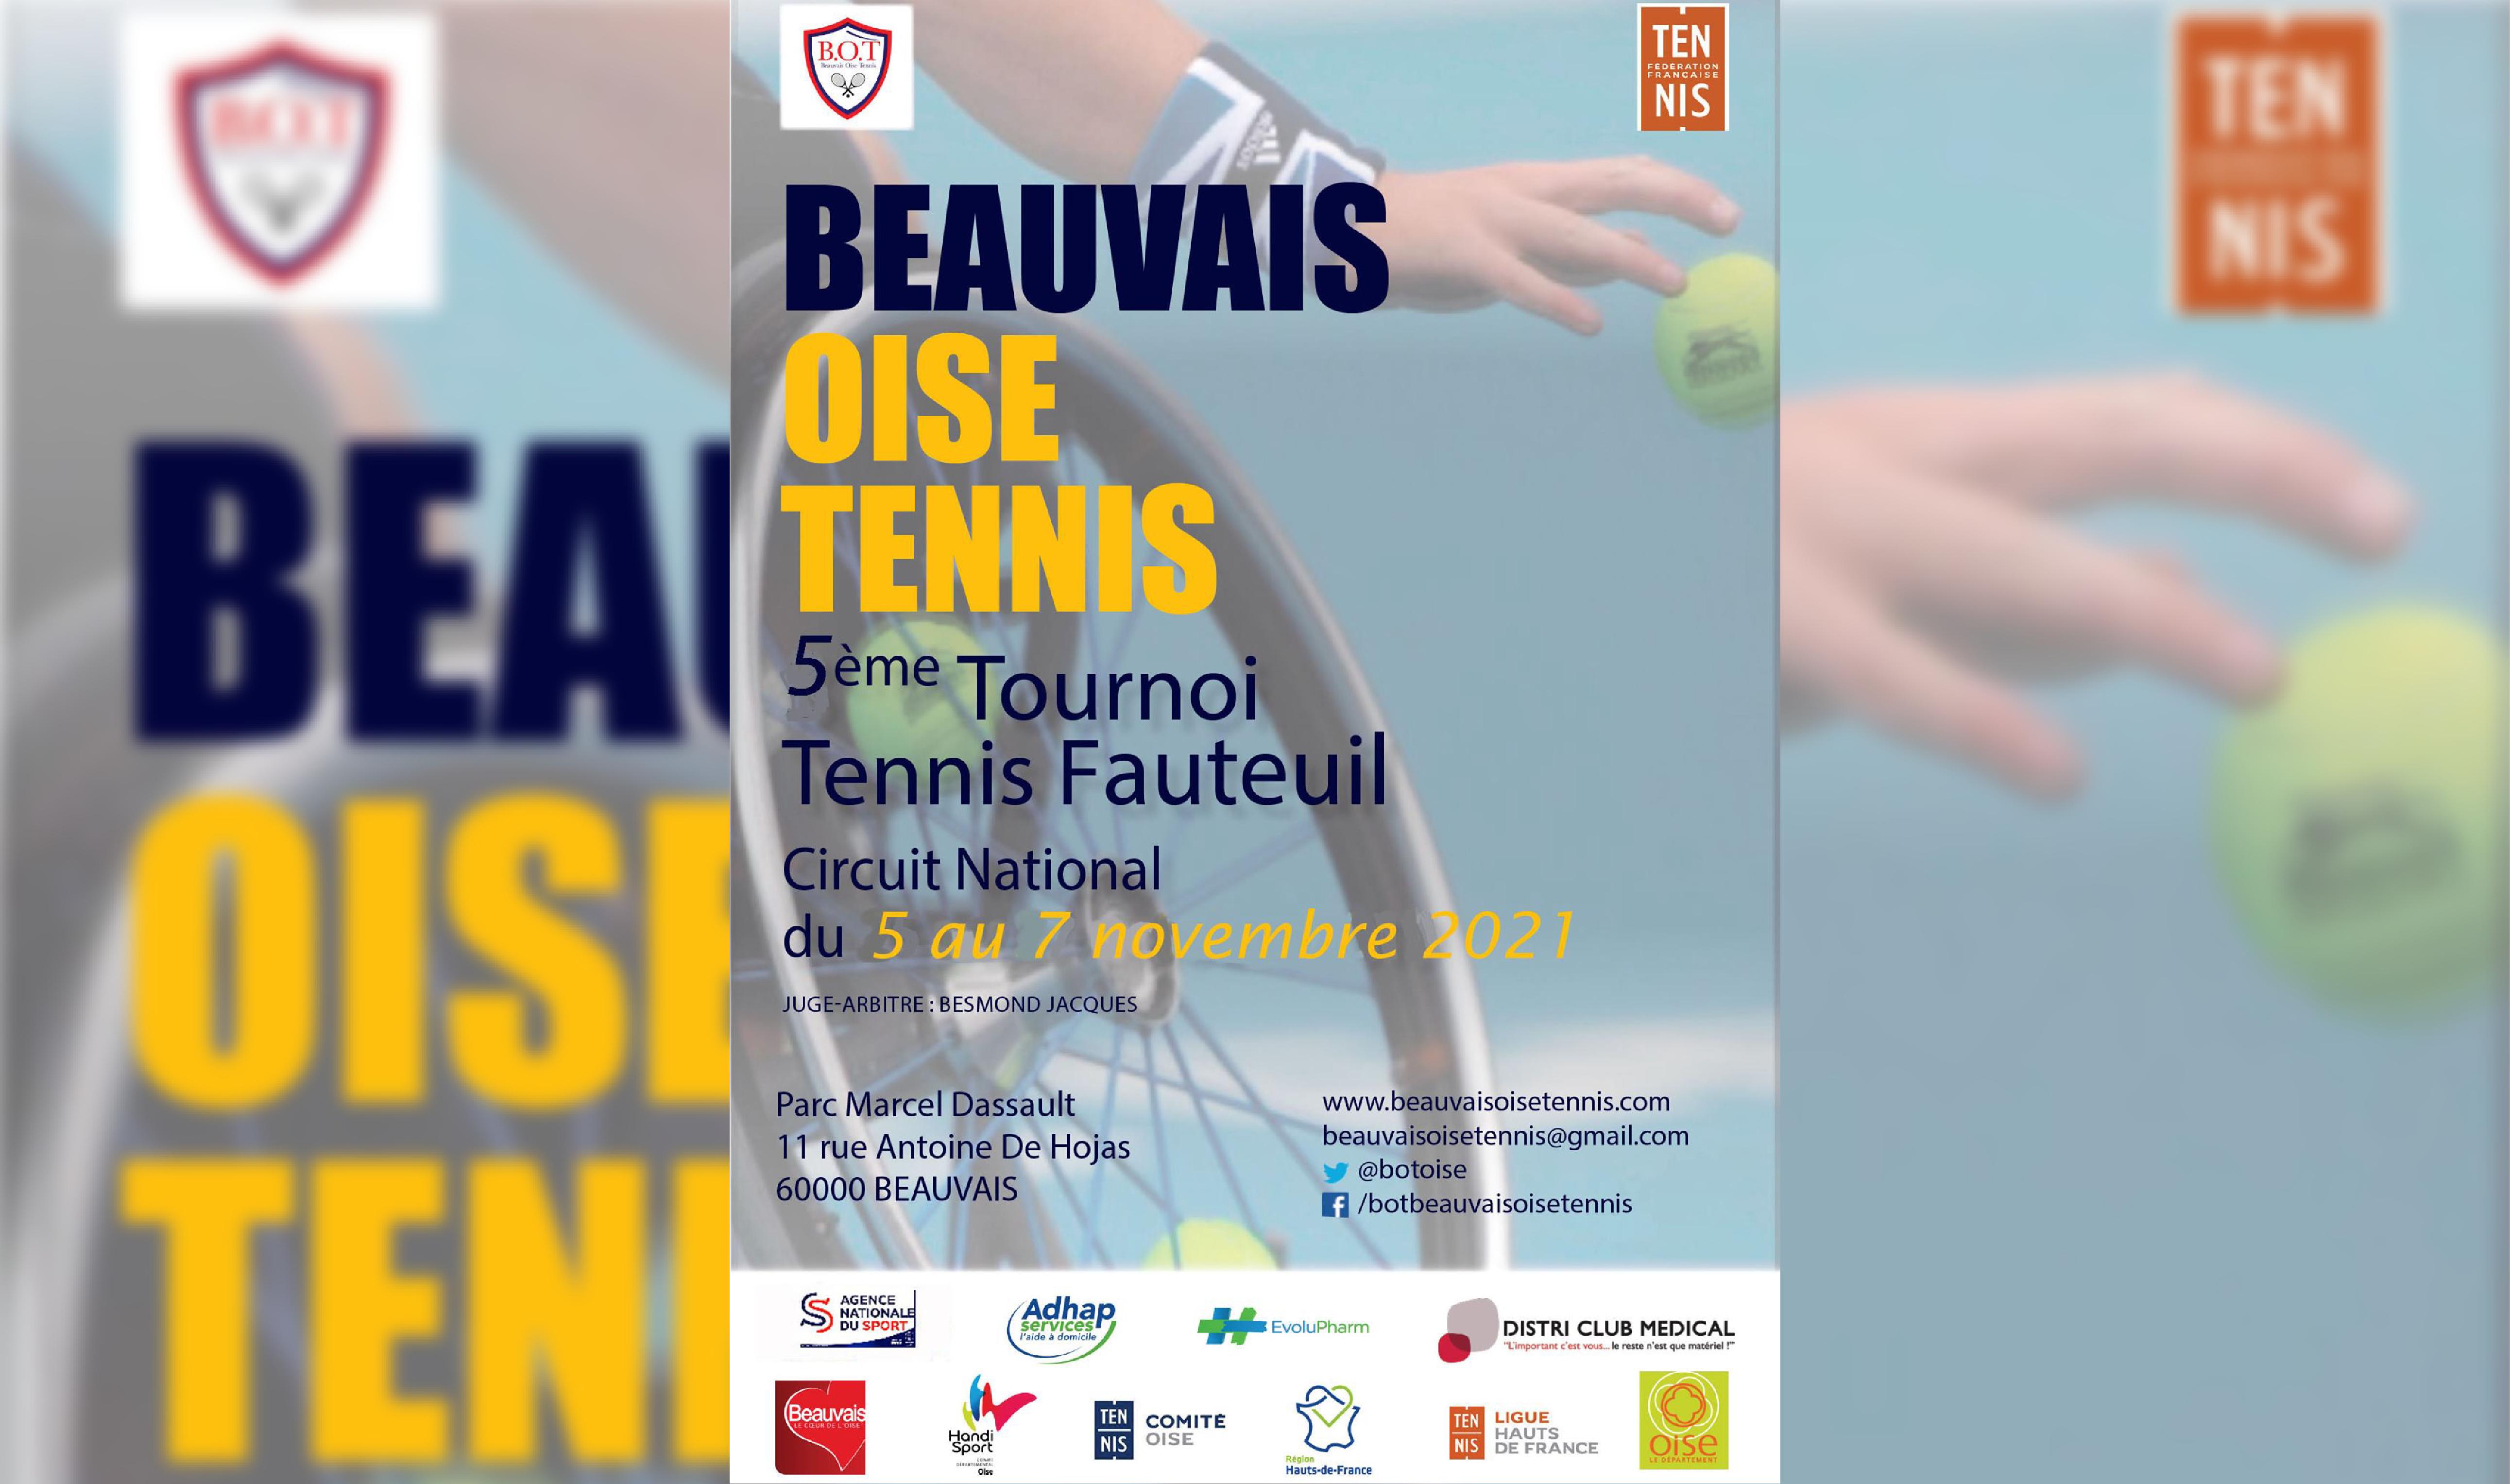 Beauvais Oise Tennis tournoi du tennis fauteuil